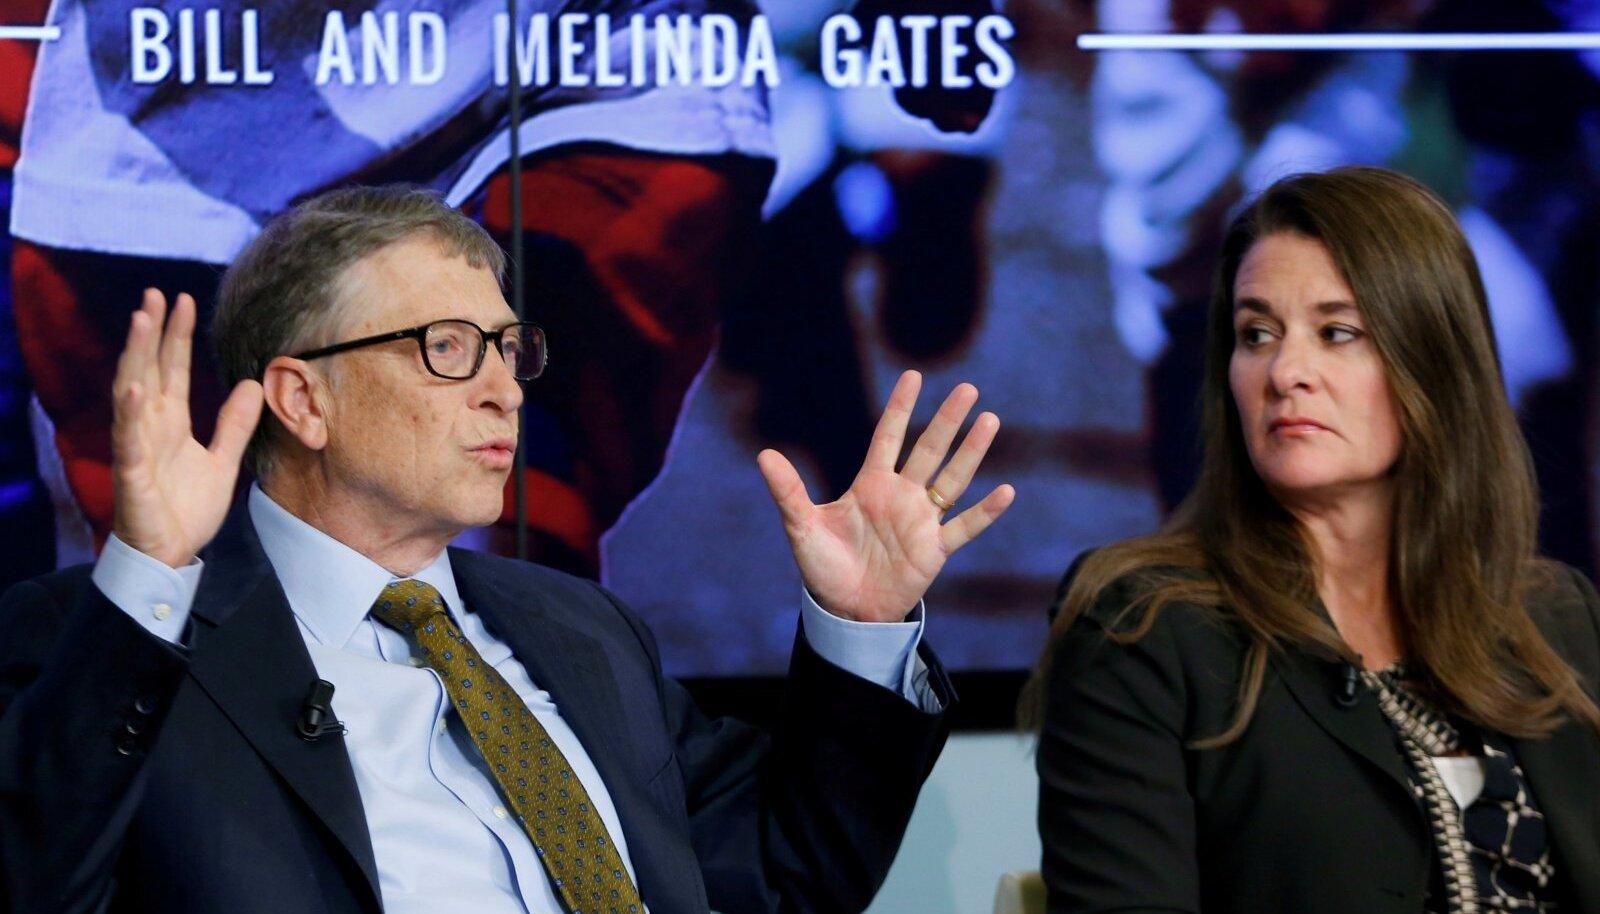 Bill ja Melinda Gates